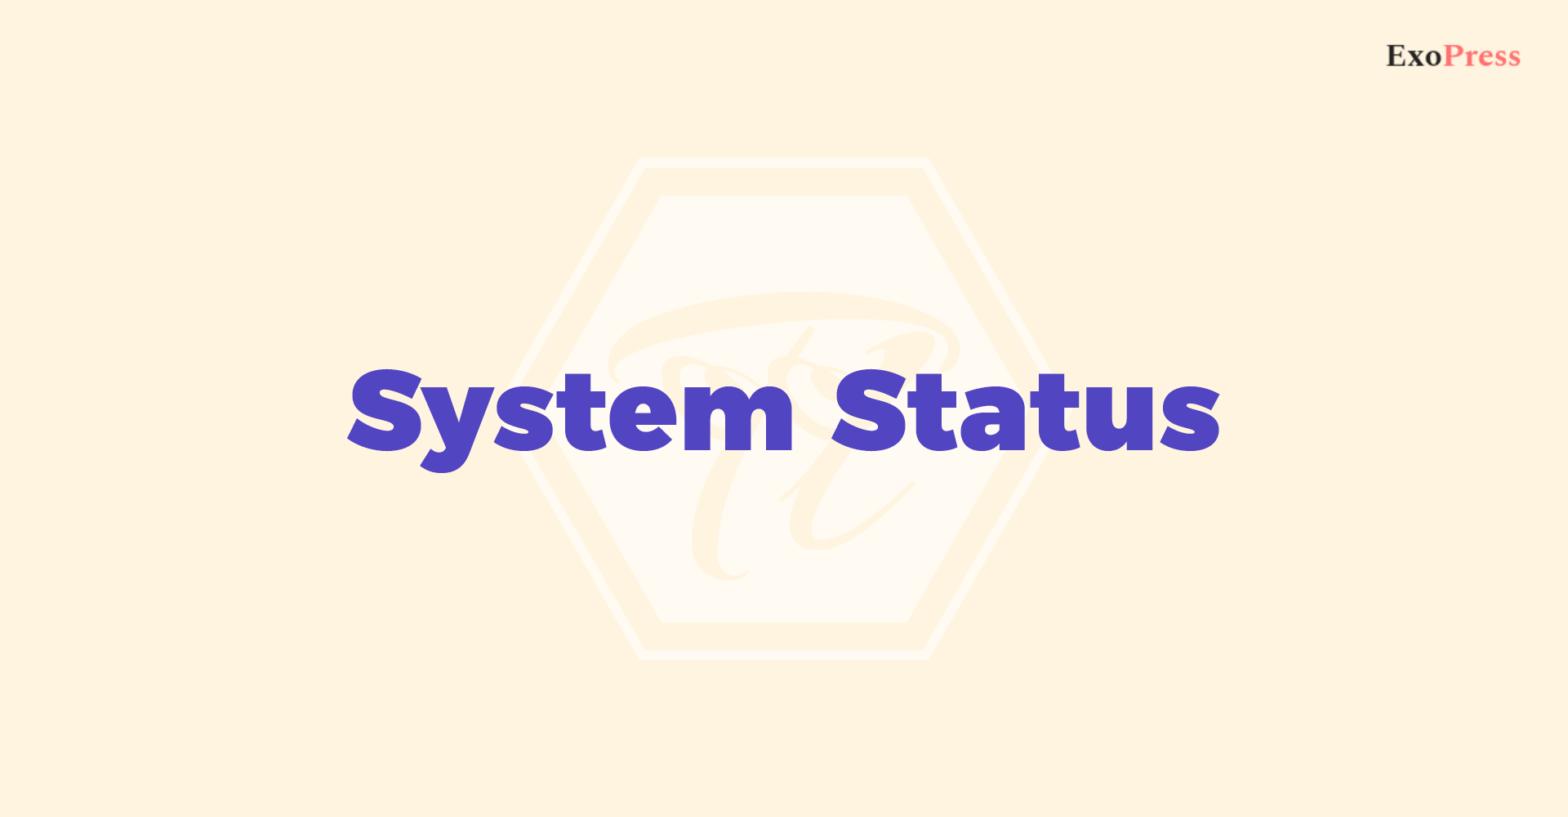 system_status 1568x817